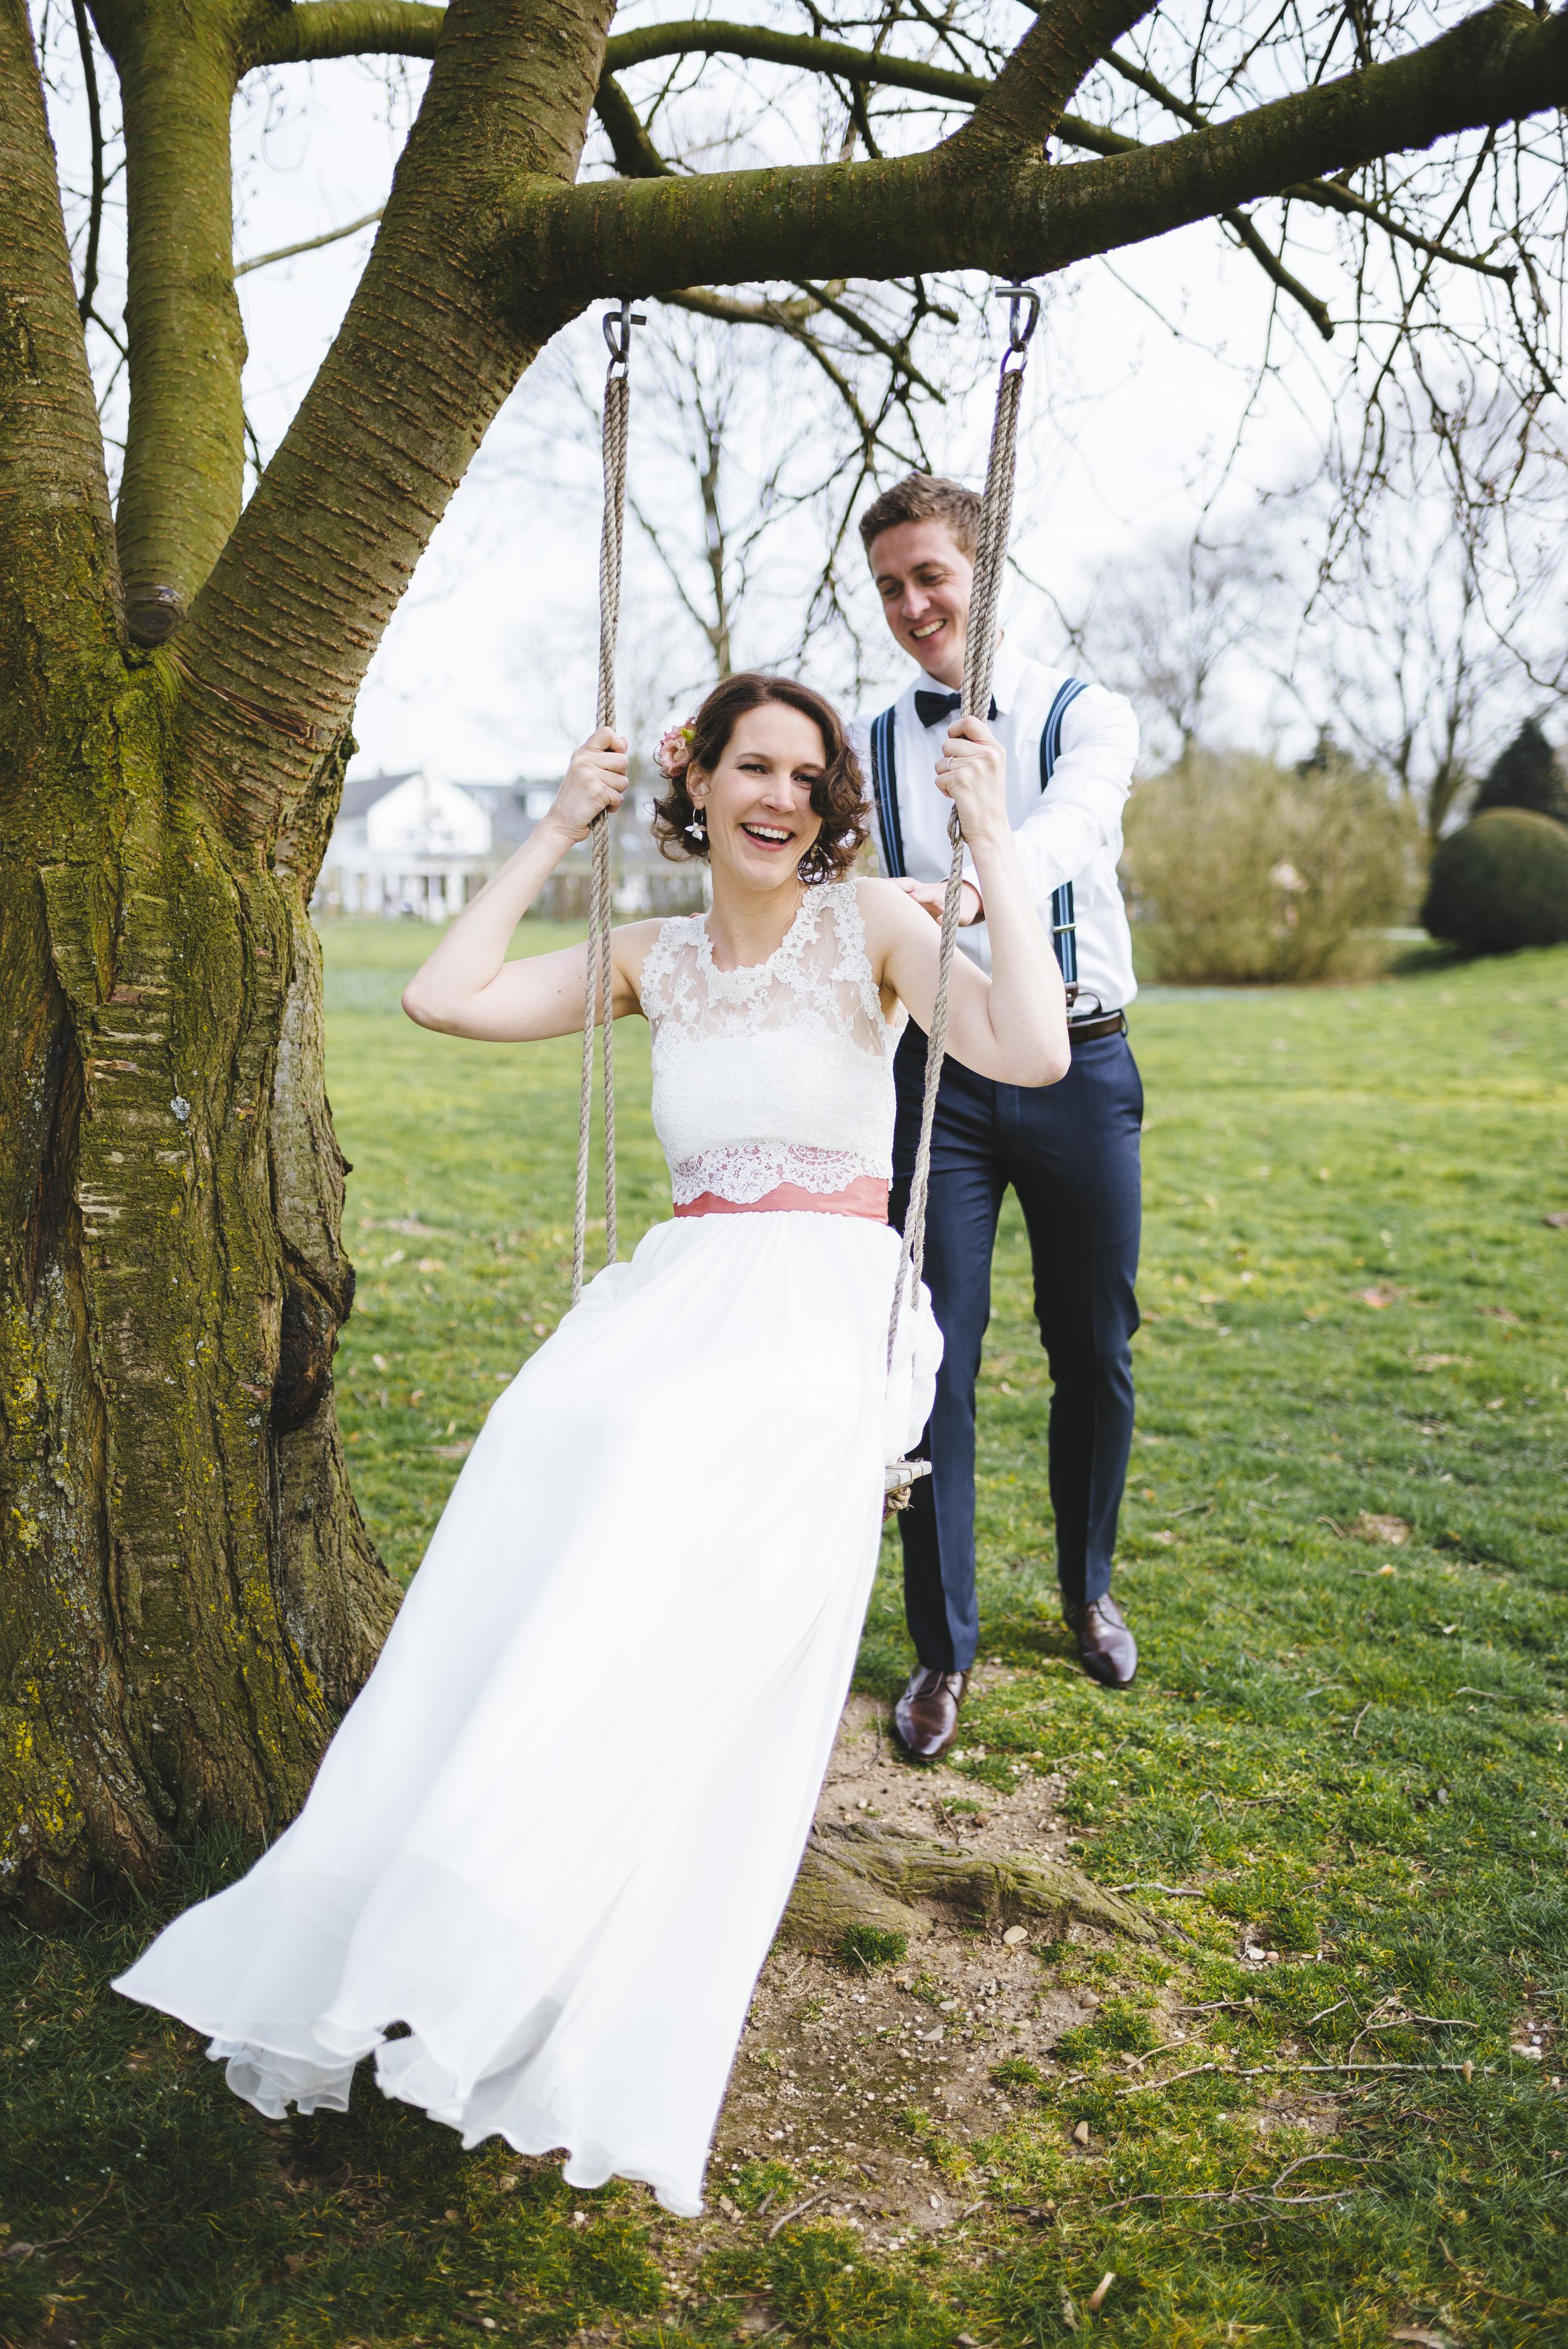 Hochzeitsfotograf-Schlossruine-Hertefeld-Weeze-035.jpg